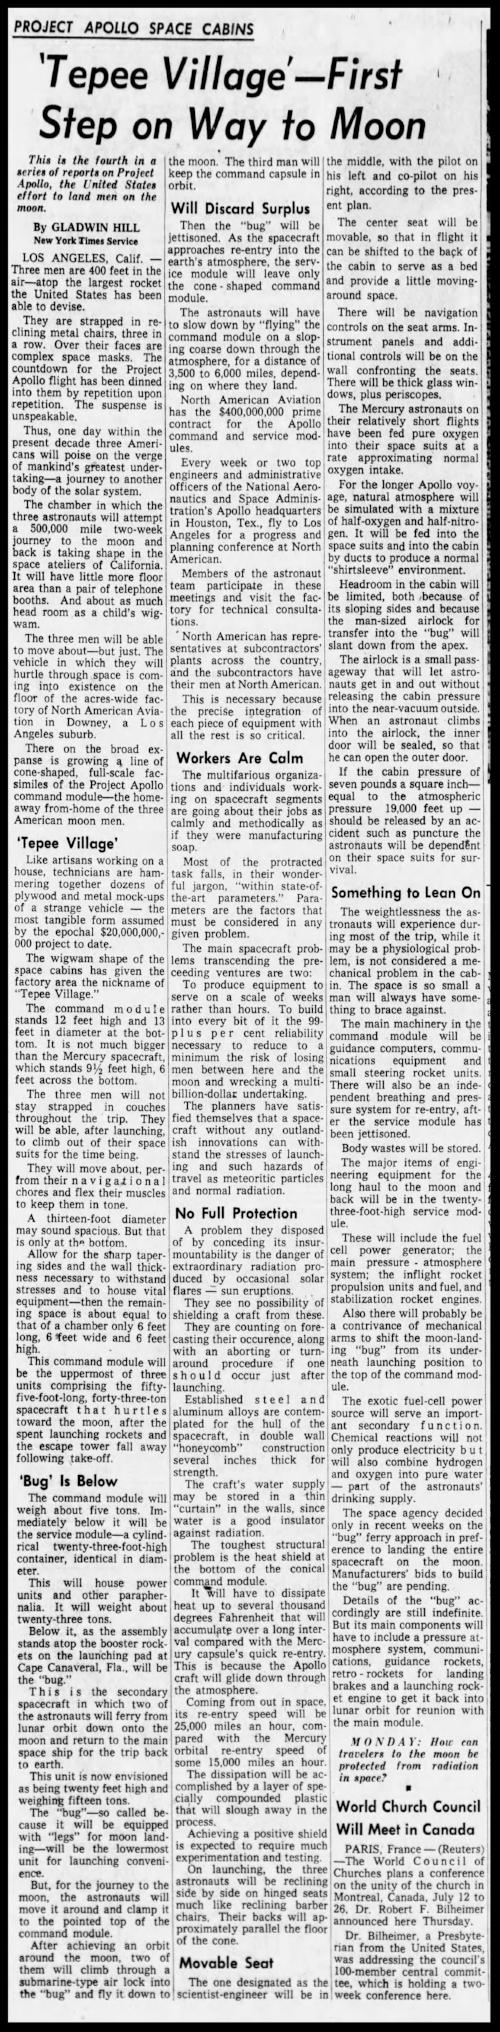 Above-Star Tribune Fri Aug 10 1962